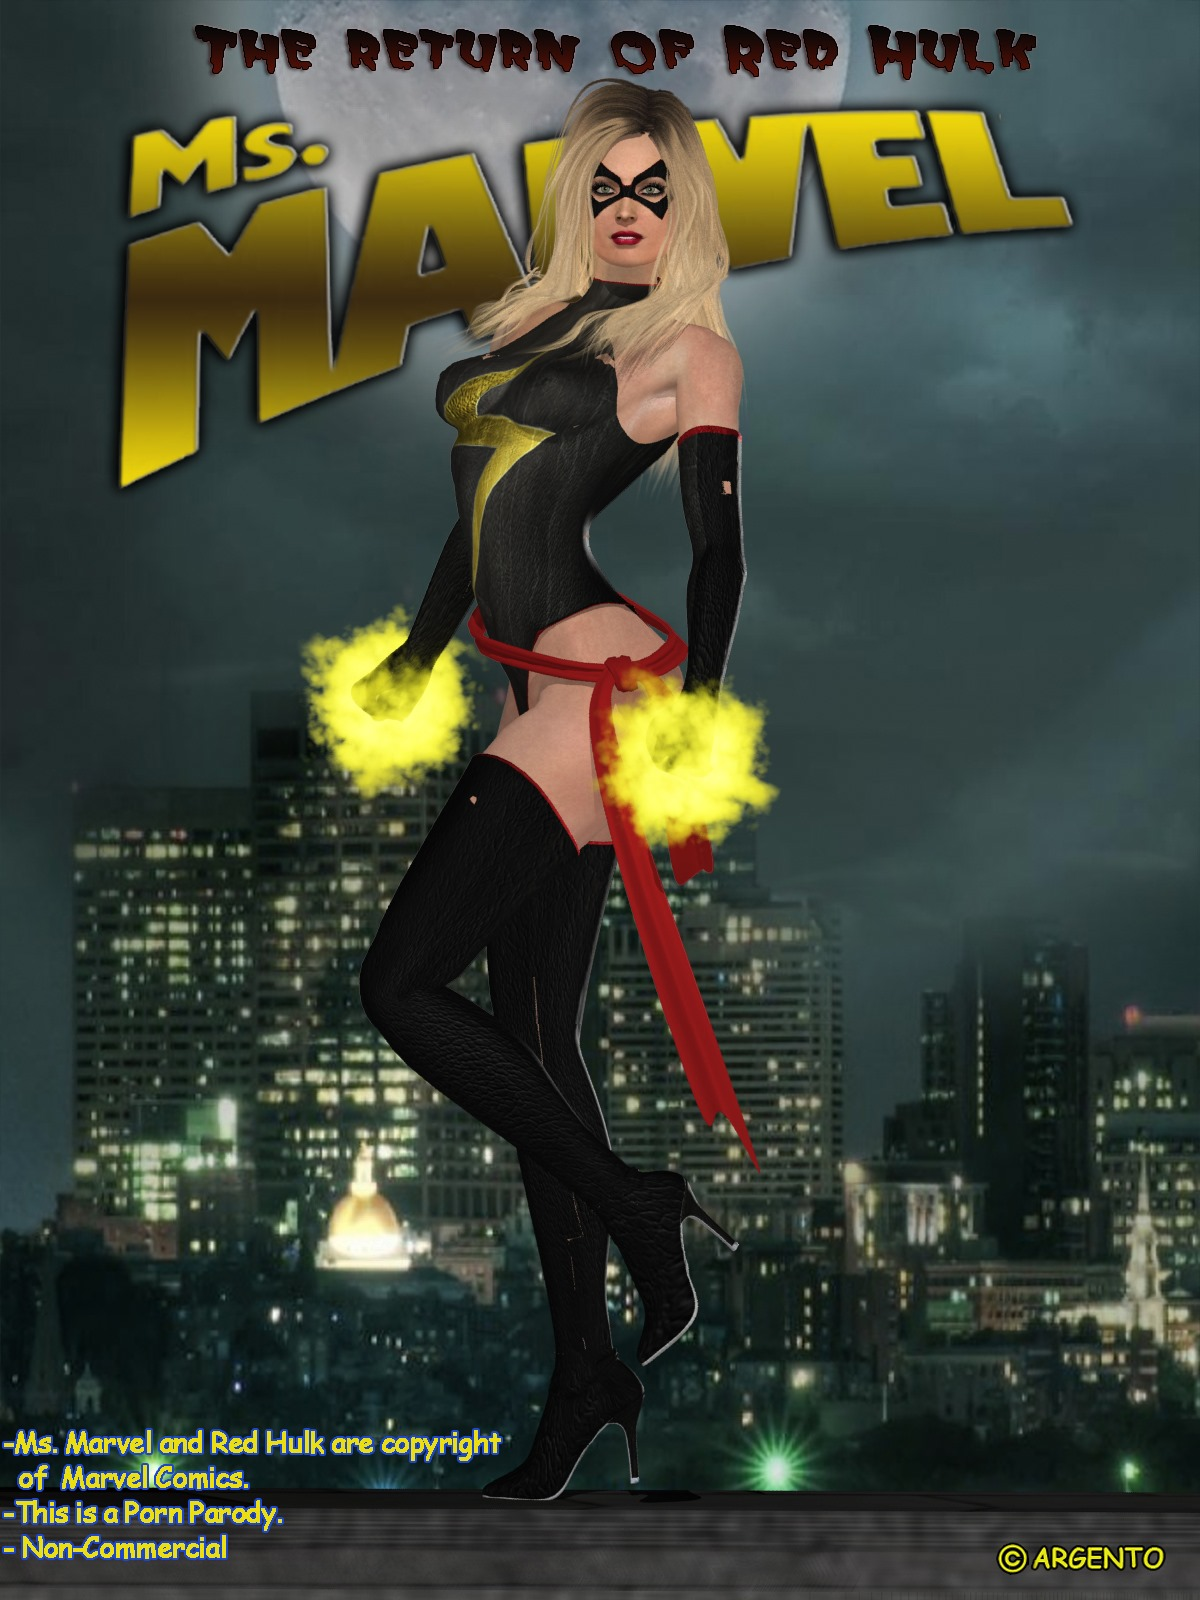 Ms. Marvel -The Return of Red Hulk image 1